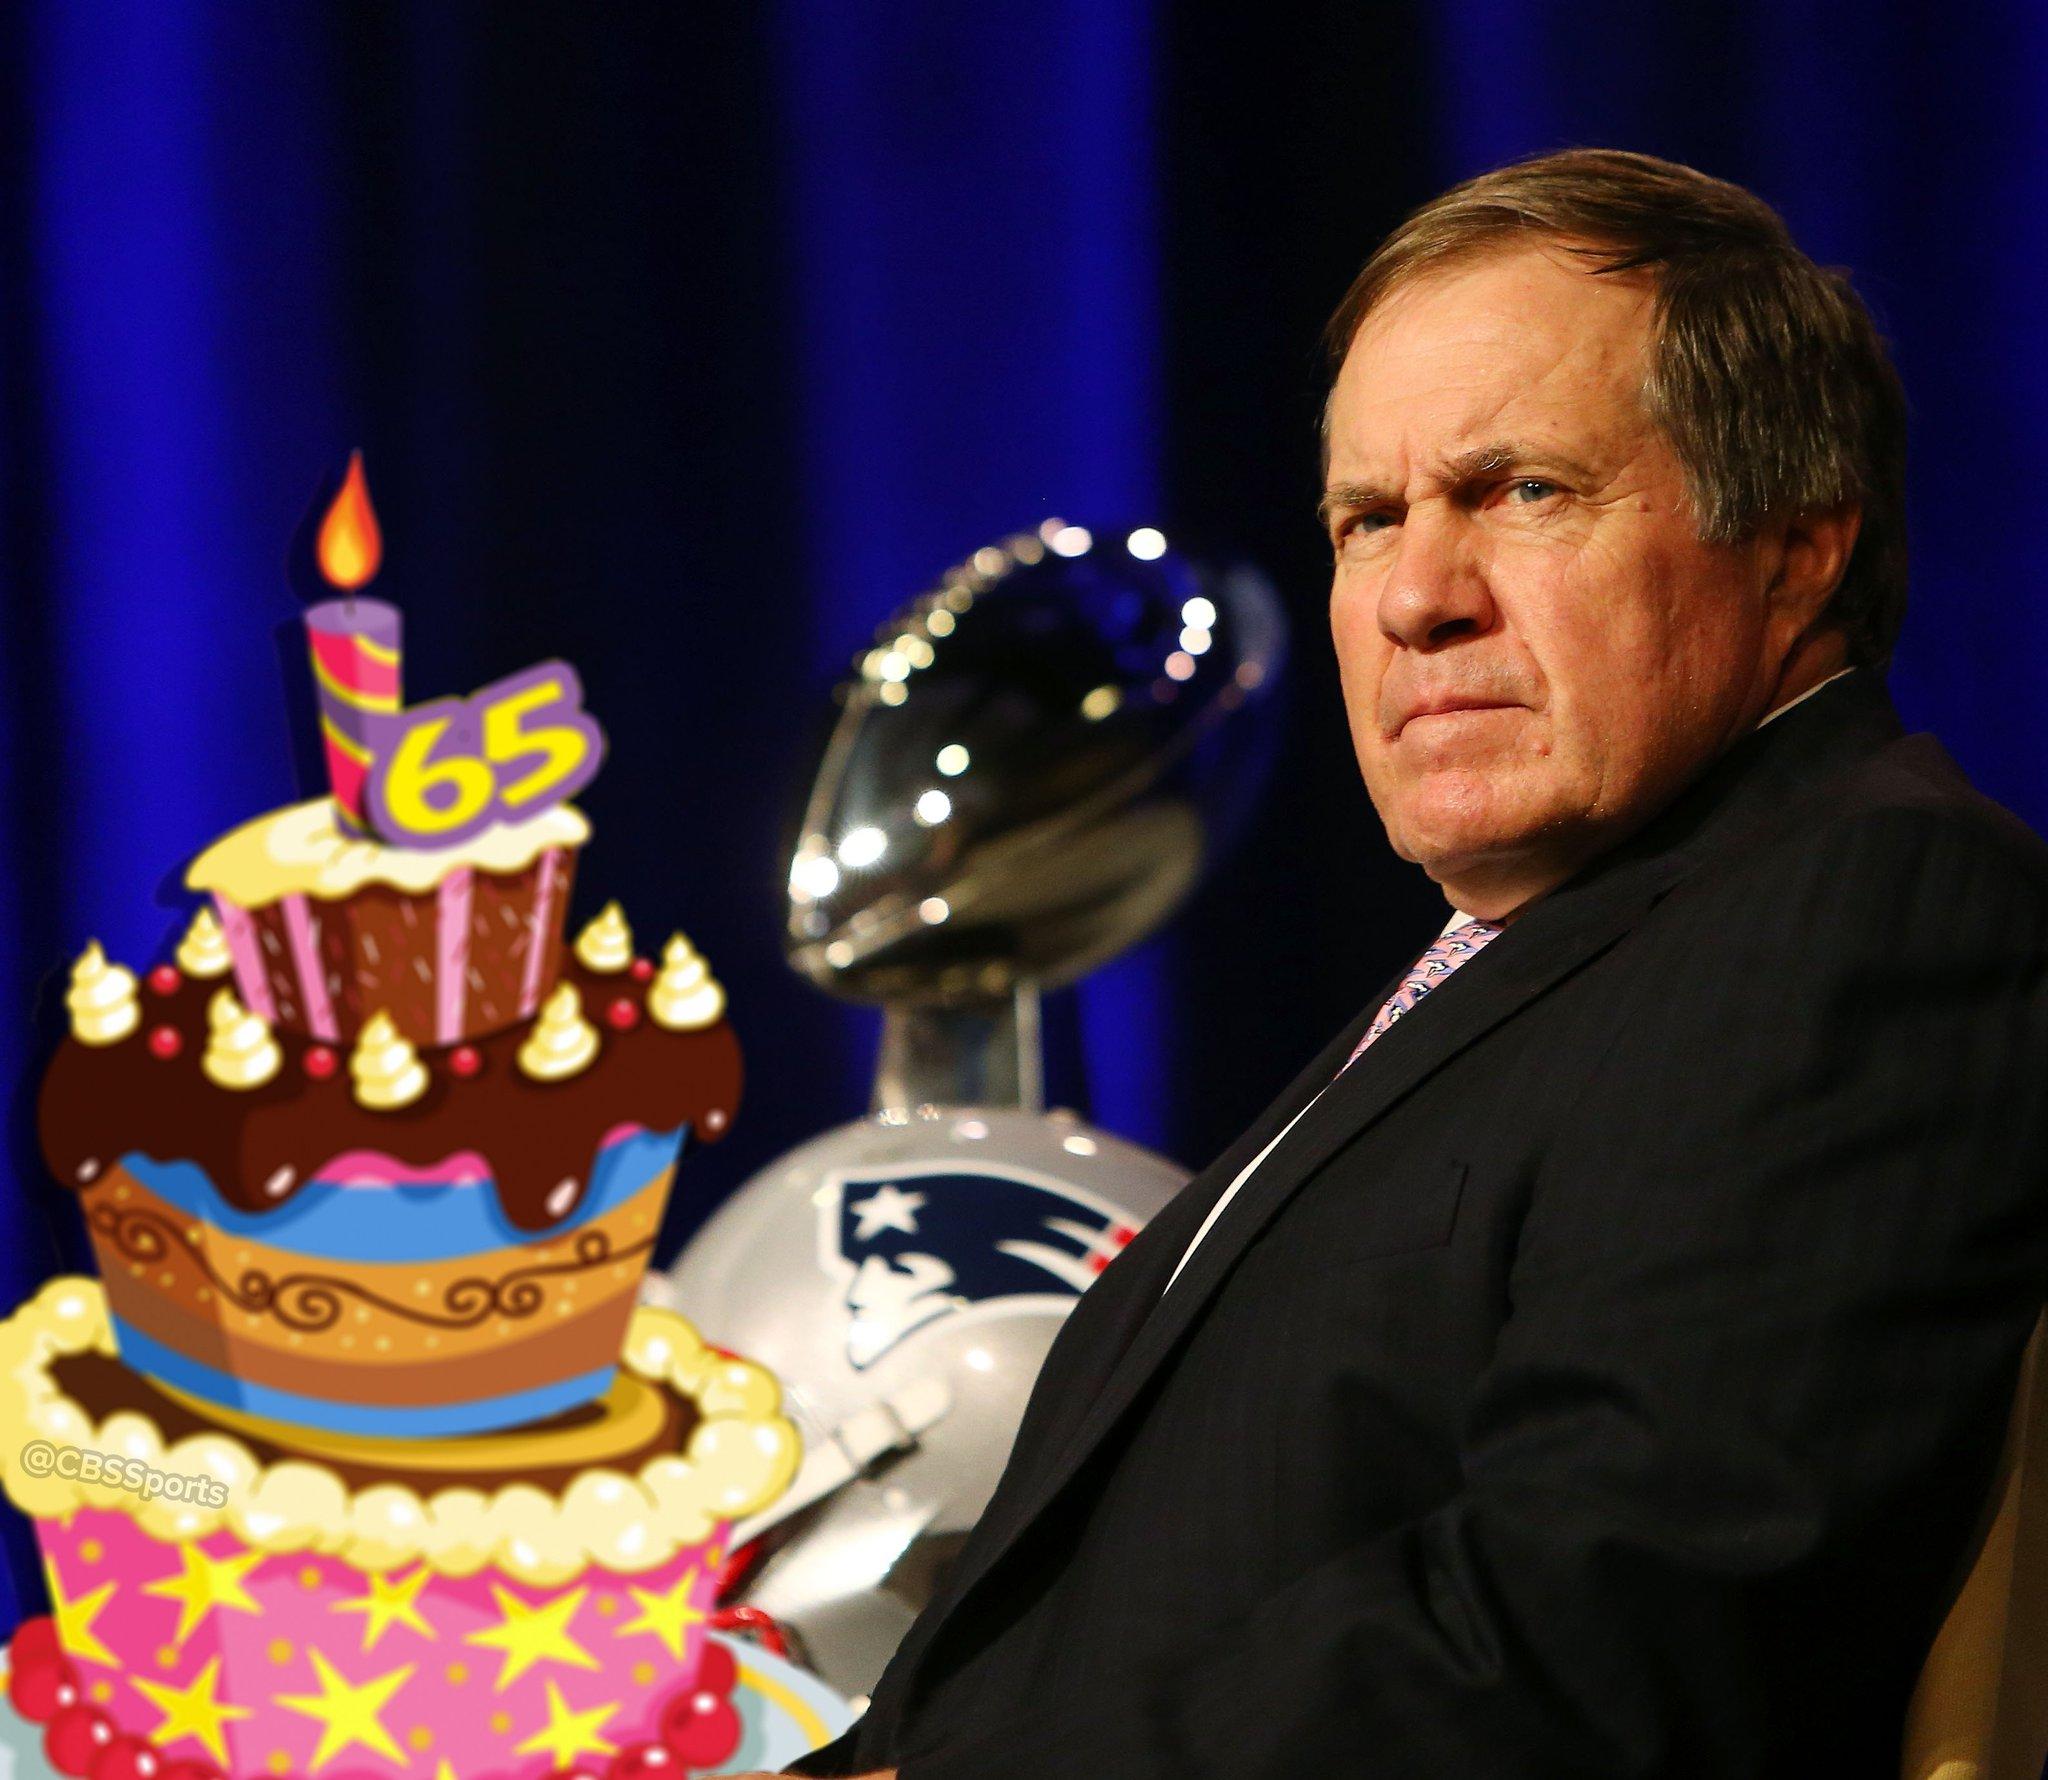 Happy 65th Birthday to Bill Belichick.